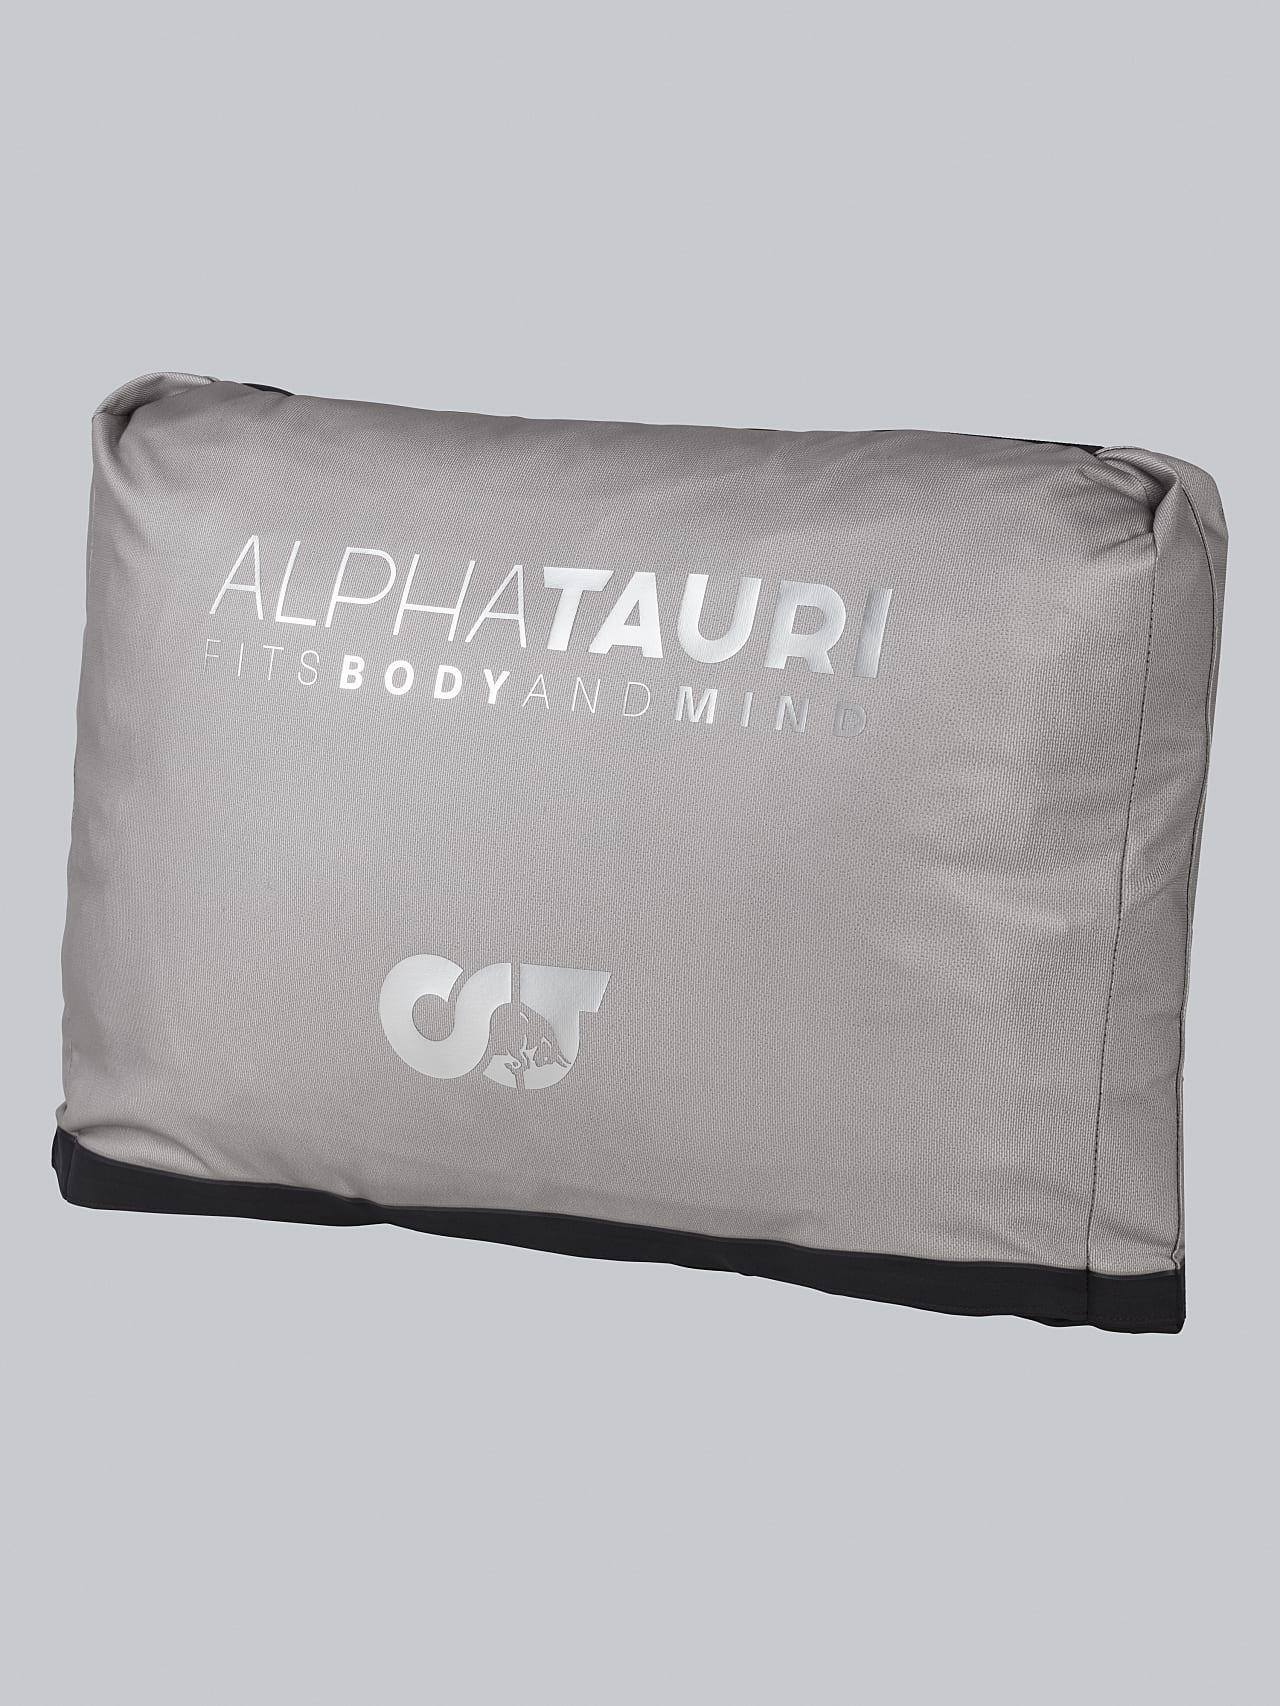 KUUV V2.Y4.02 Packable Waterproof Winter Parka black scene7.view.12.name Alpha Tauri